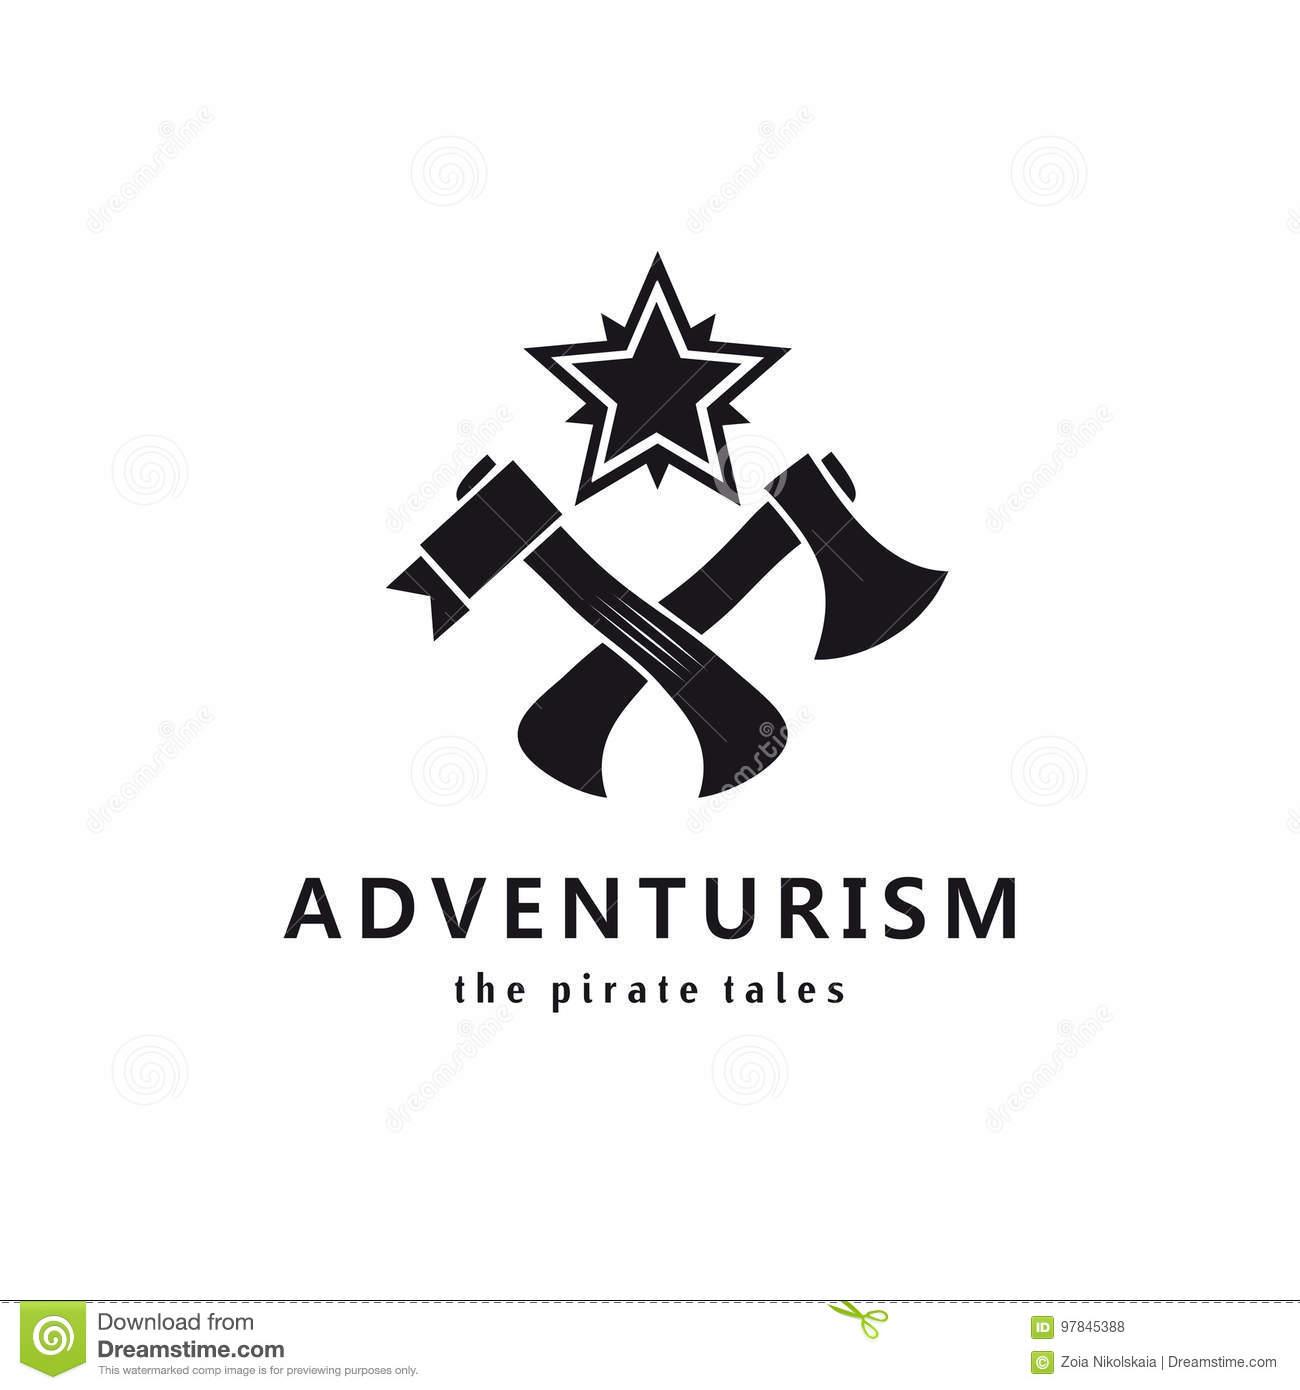 adventurism